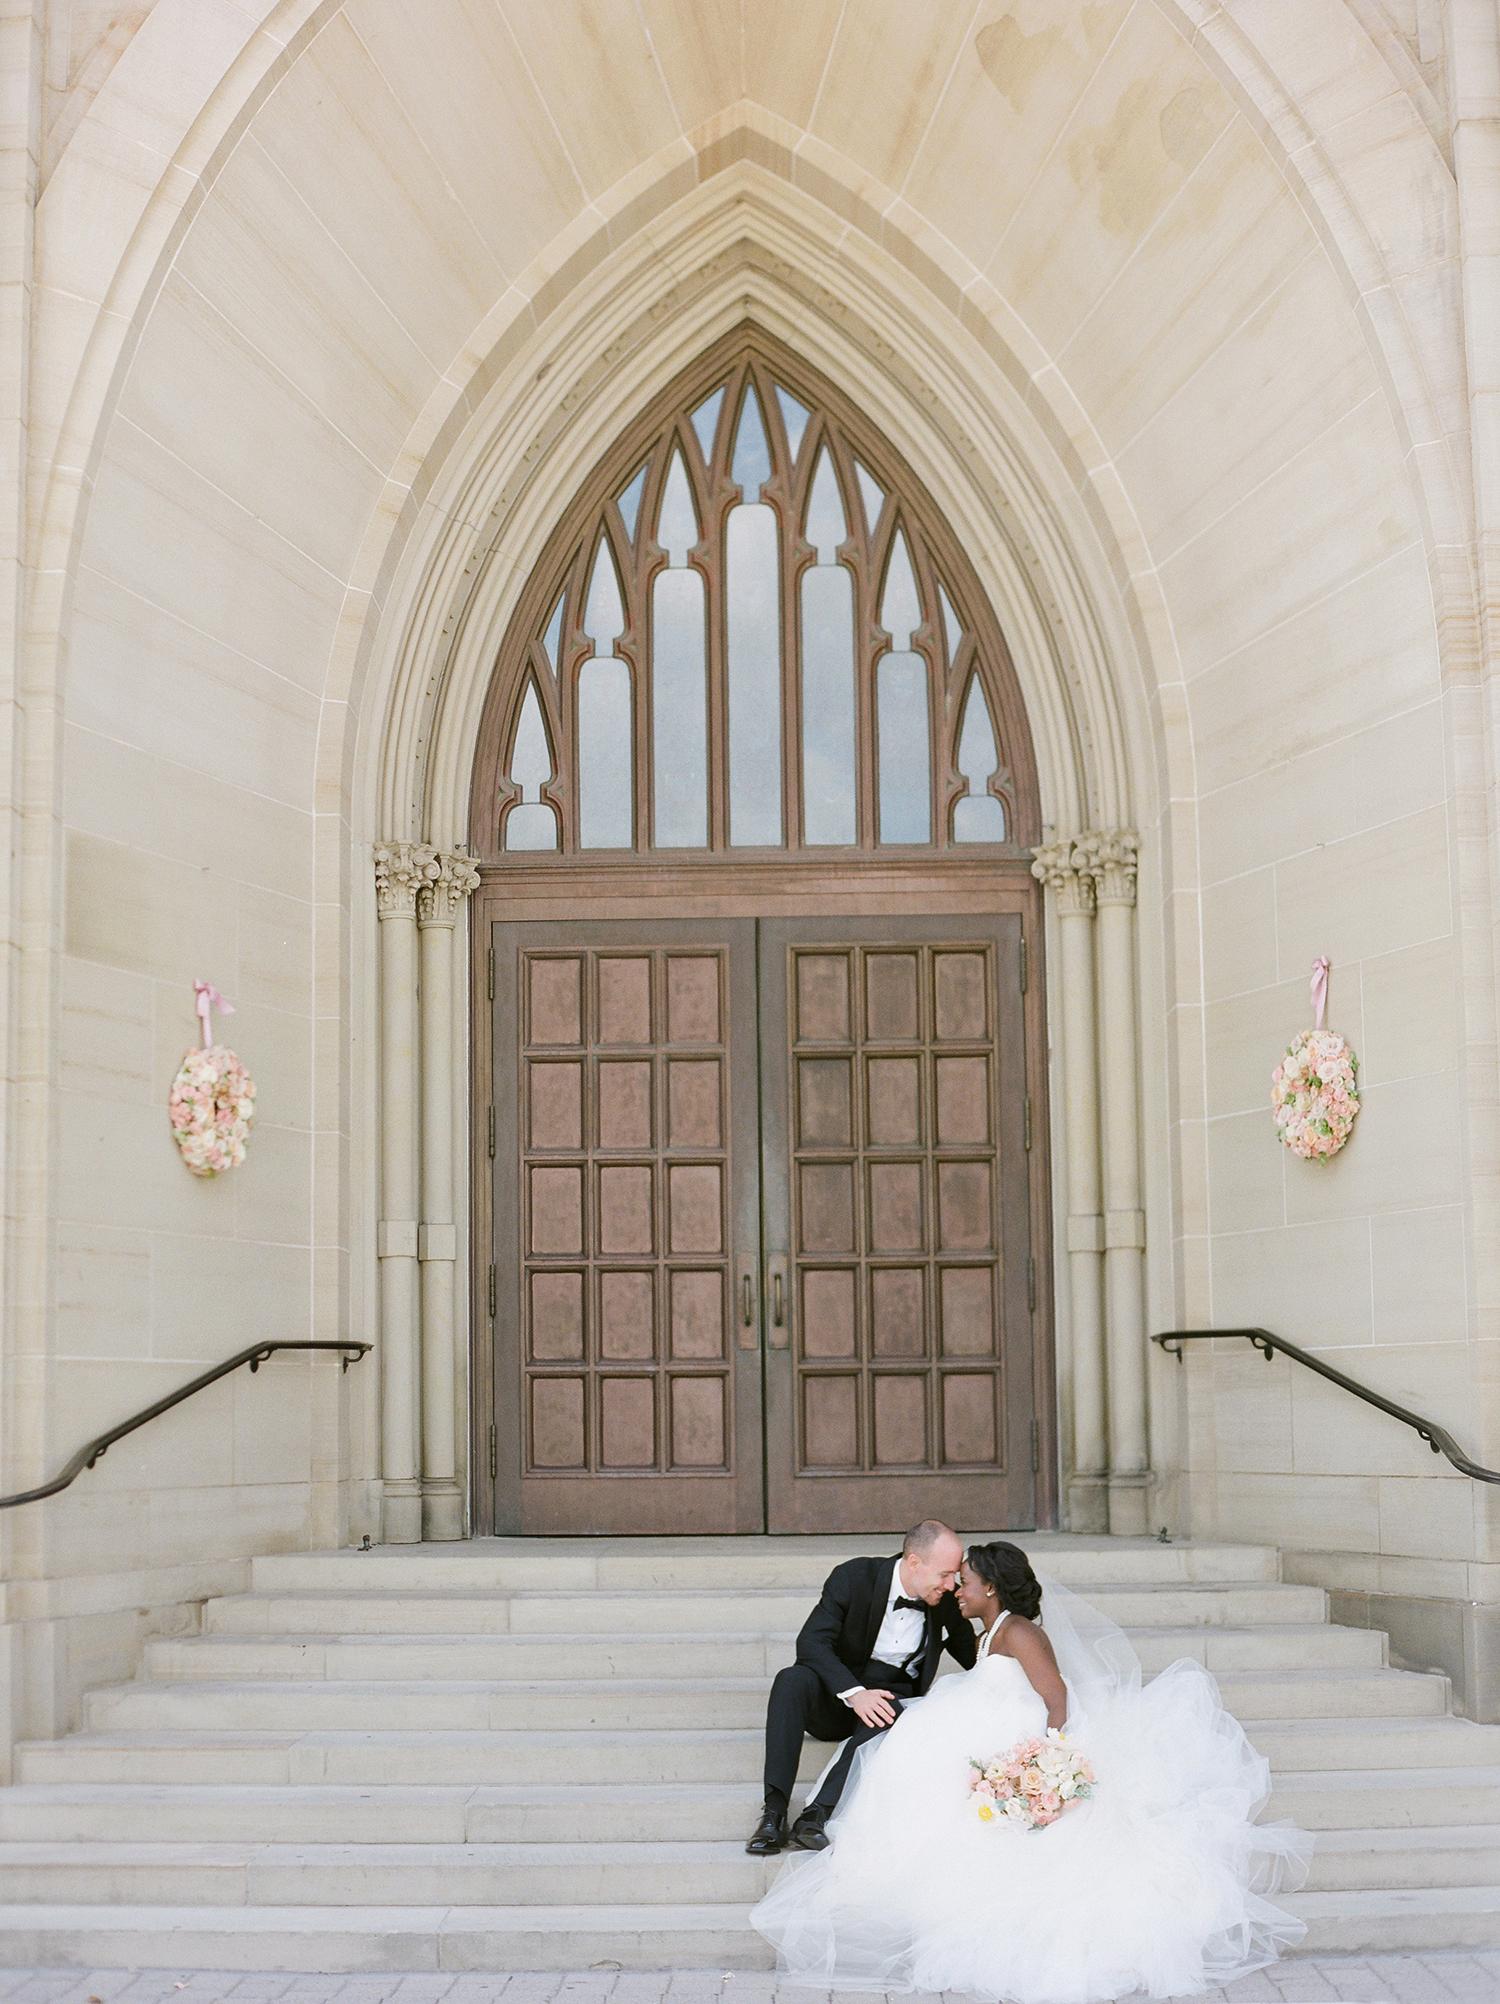 anwuli patrick wedding couple on church steps